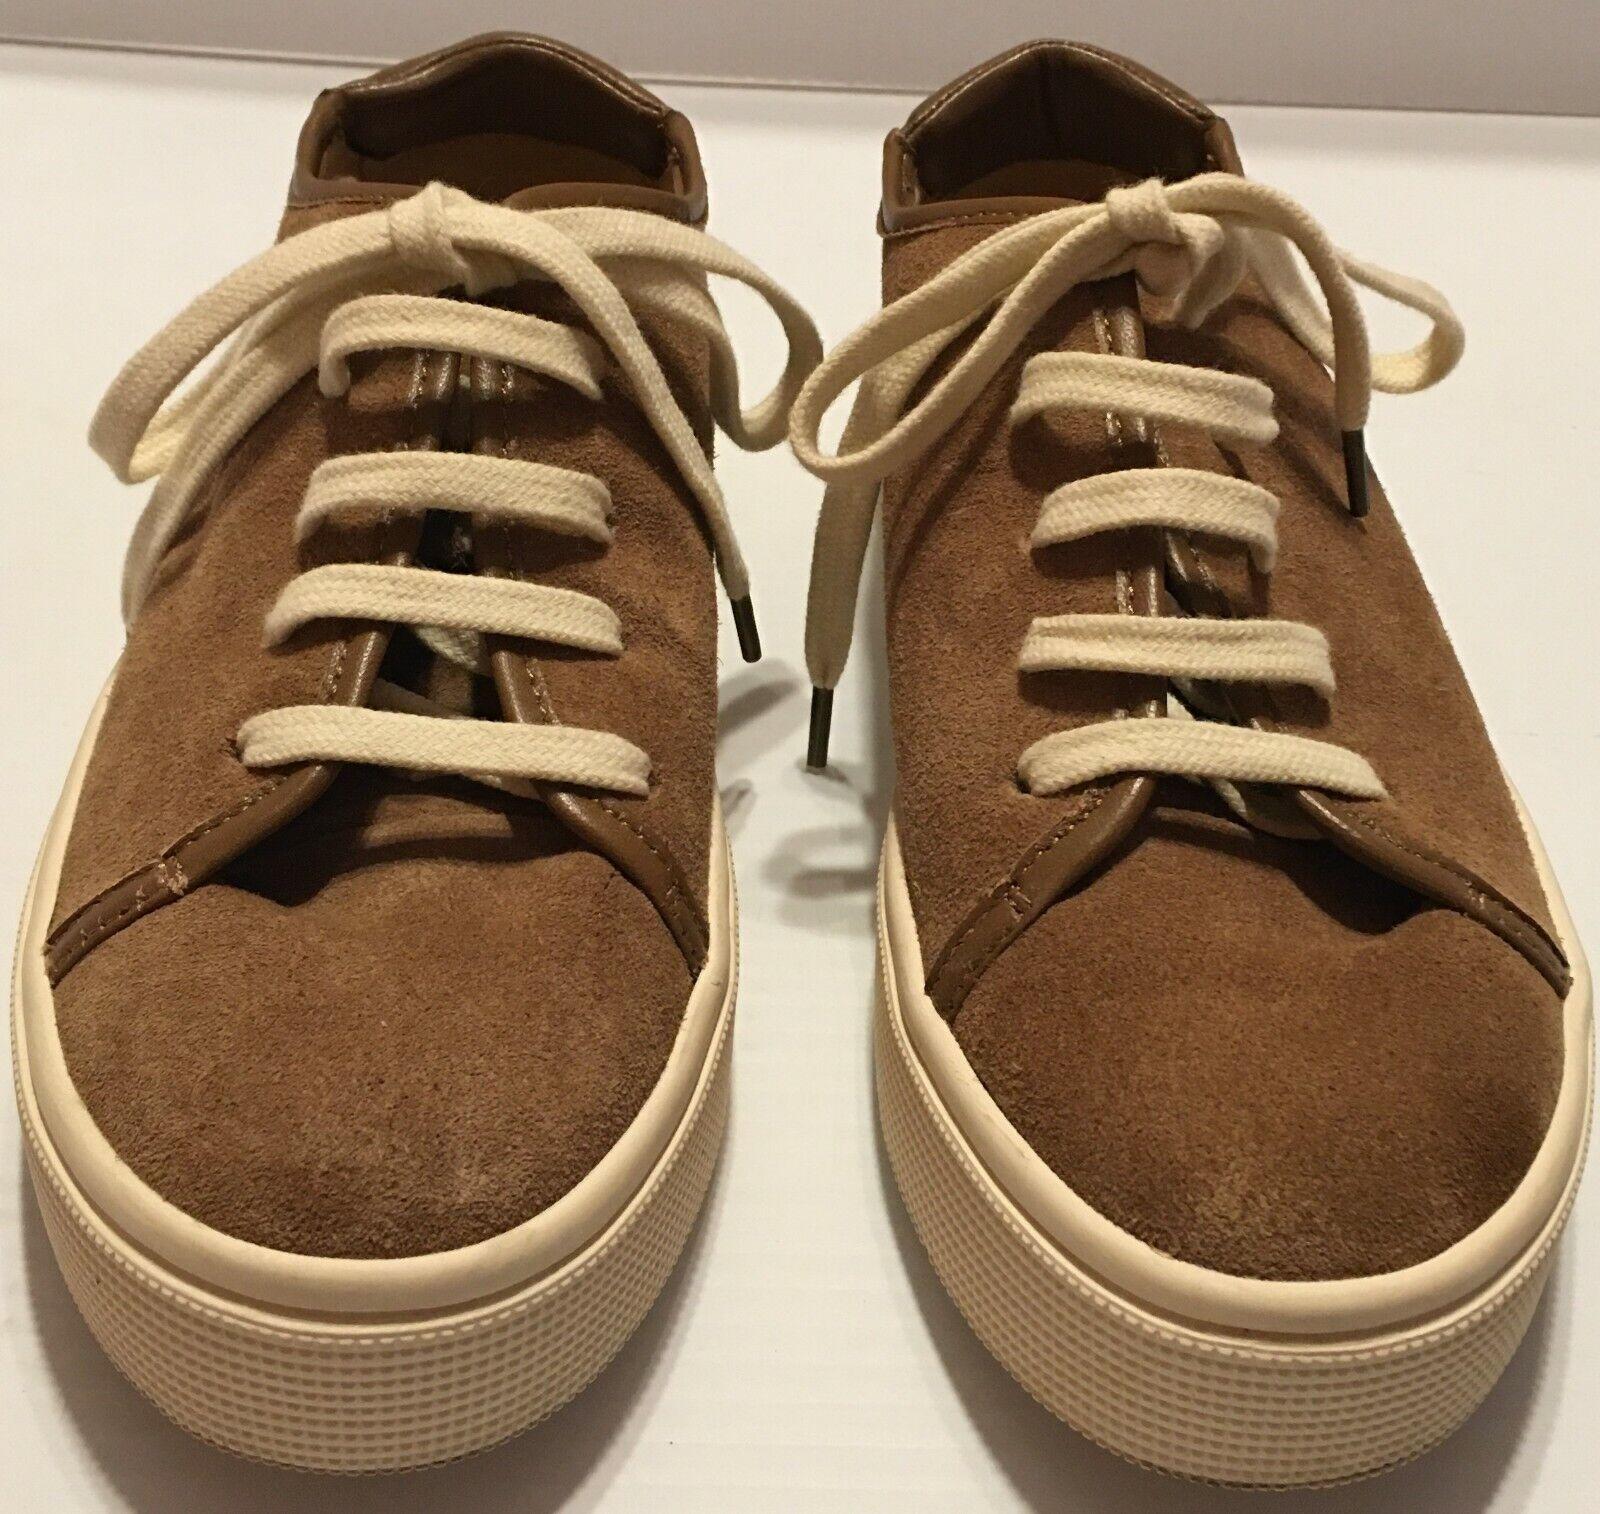 Splendid Women's Shoes Norvin Leather Low Top Lace Up Suede Sneakers Oakside 6.5